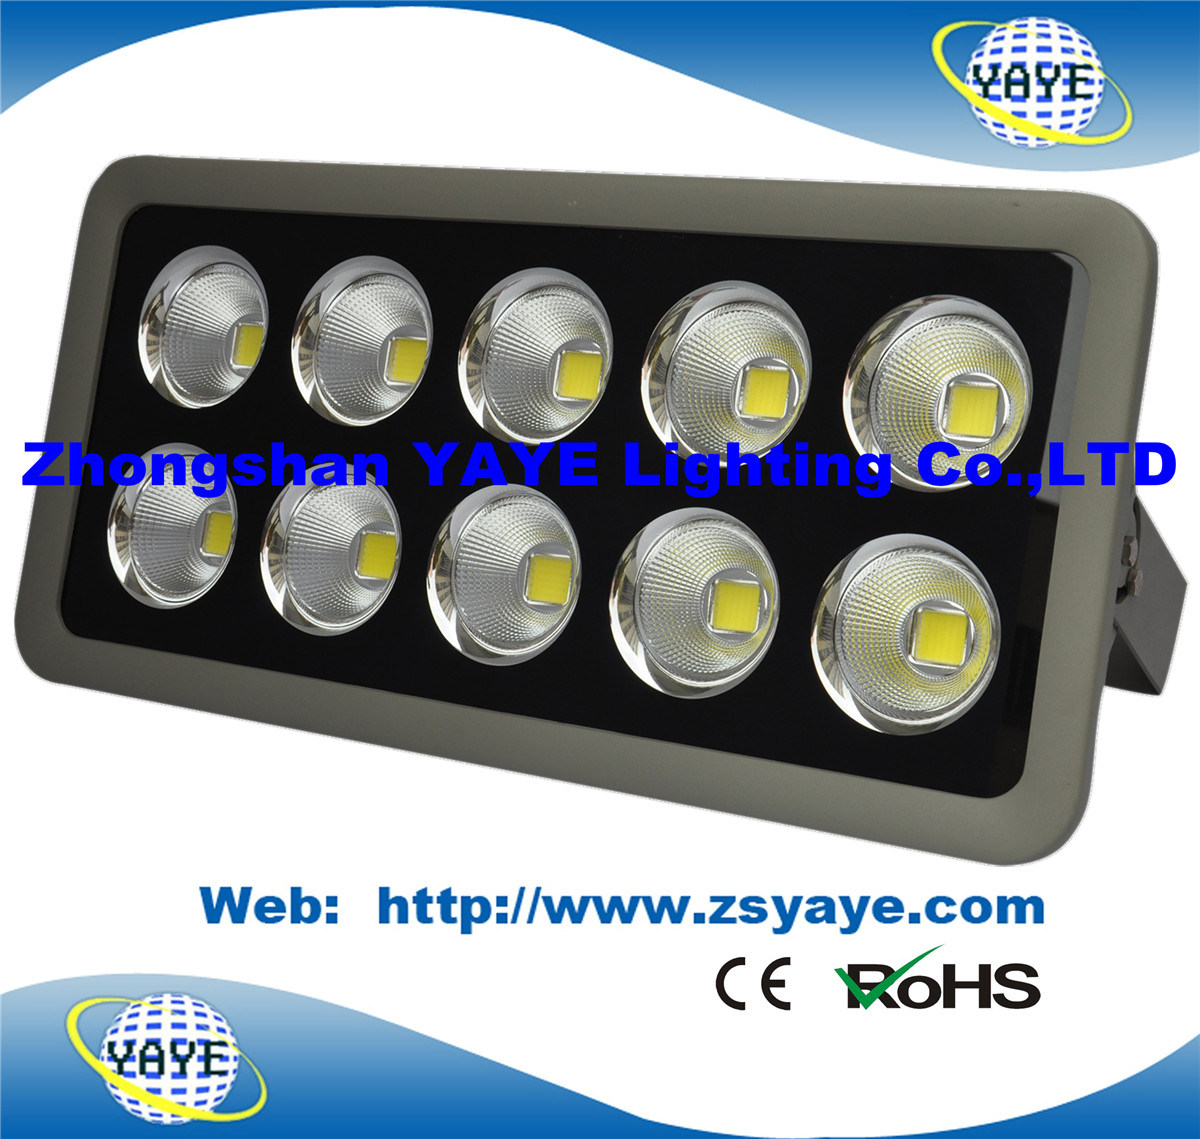 Yaye 18 Hot Sell 3/5 Years Warranty Ce/RoHS Hot Sell 500W LED Flood Light /500W LED Tunnel Light /500W LED Spotlight